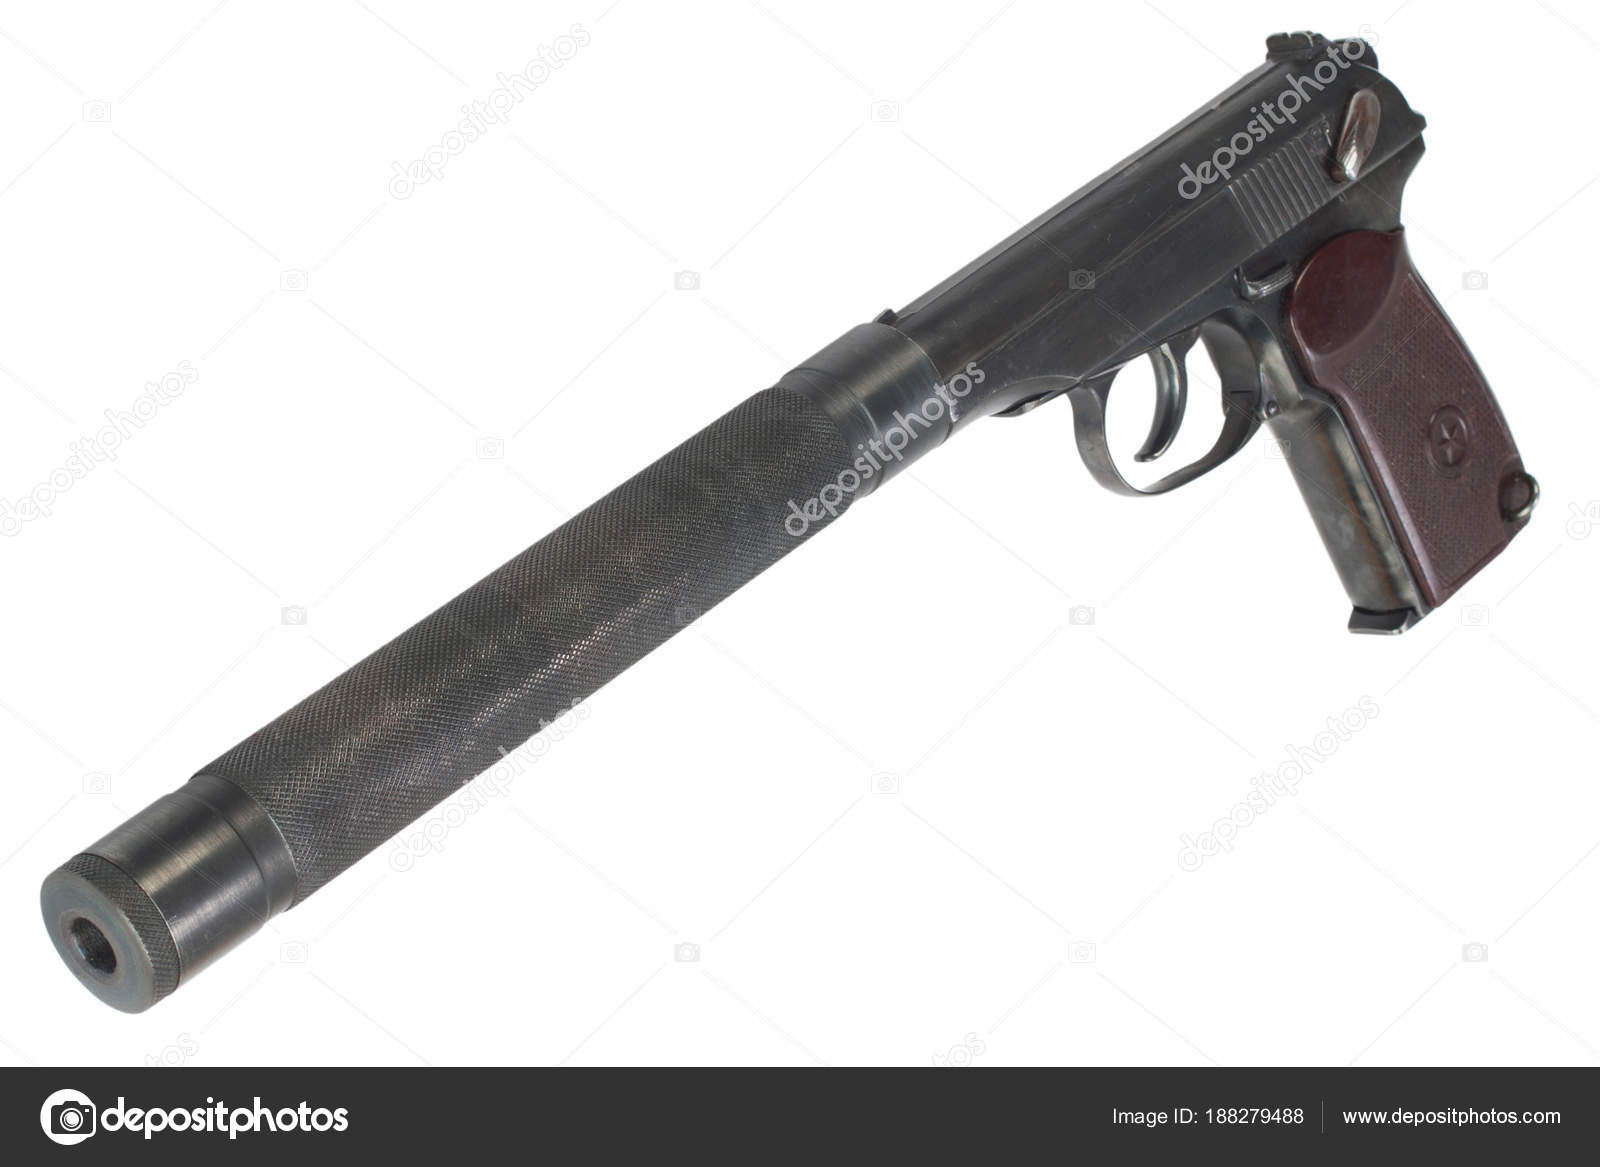 ussr makarov pistol silencer isolated stock photo zim90 188279488